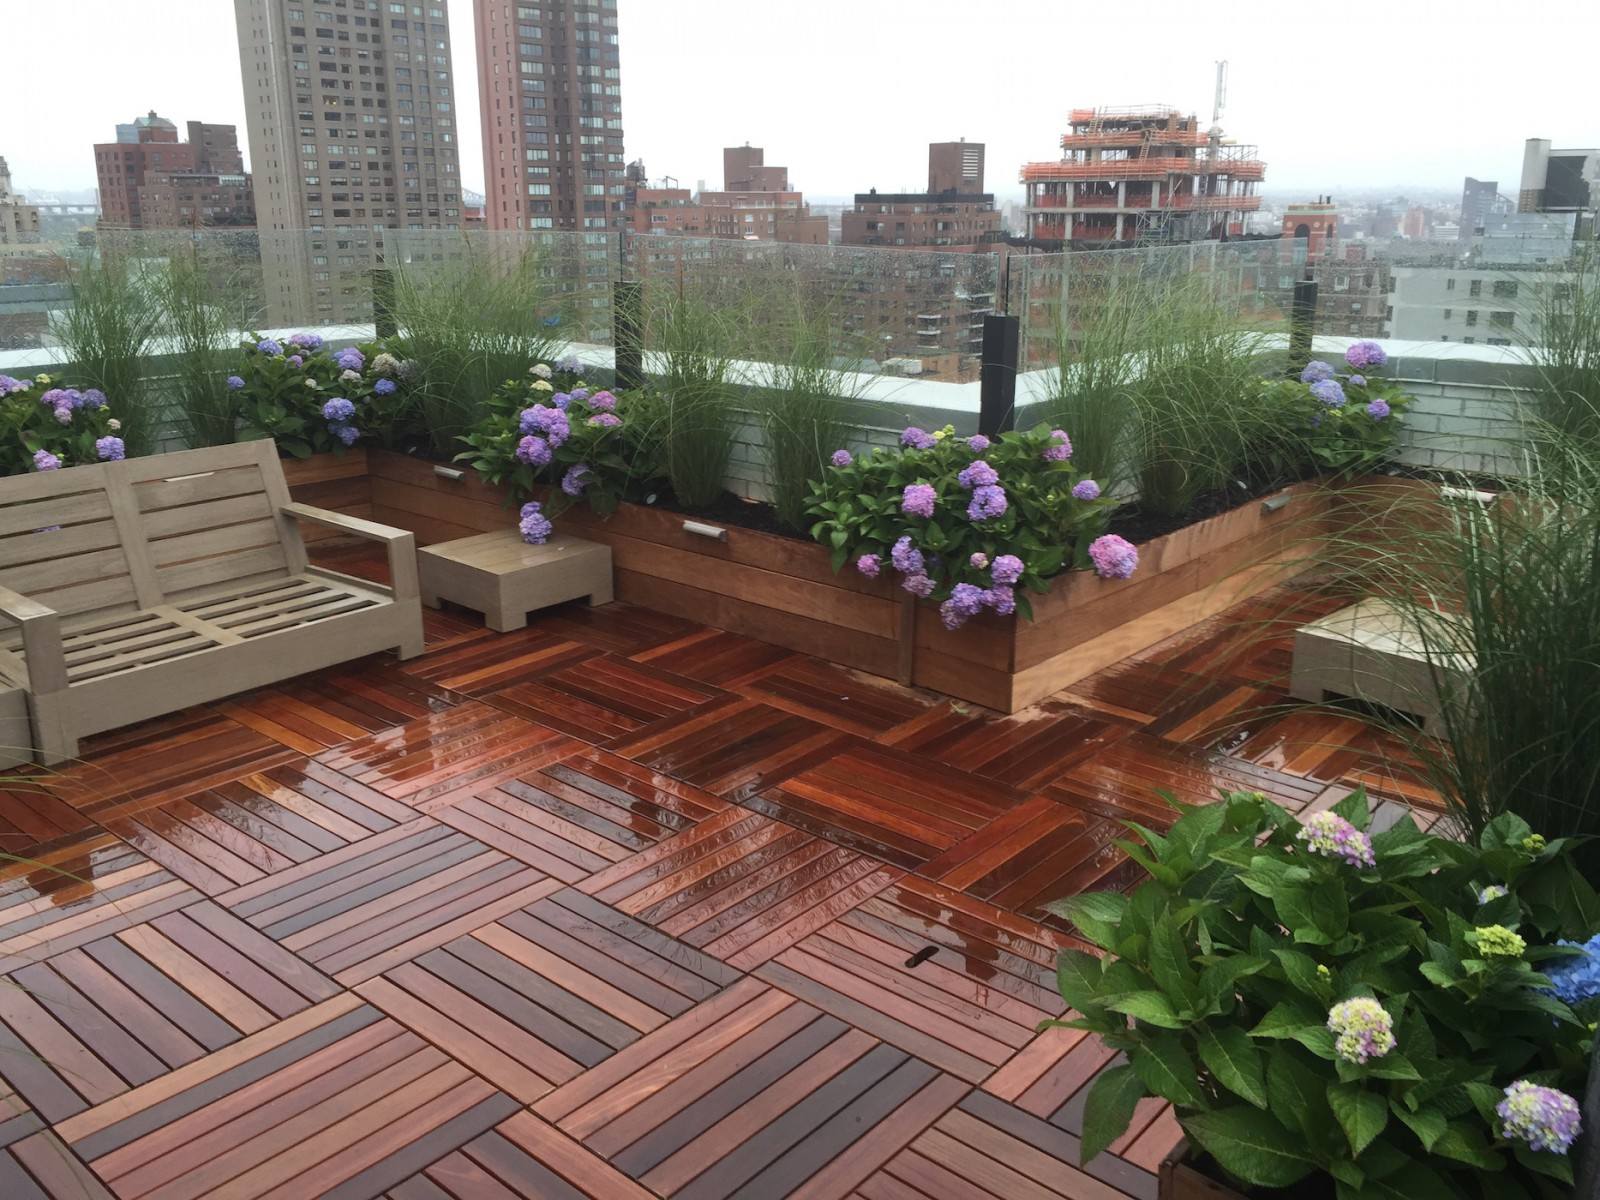 Nyc Roof Decks Gardens Rooftop Decks